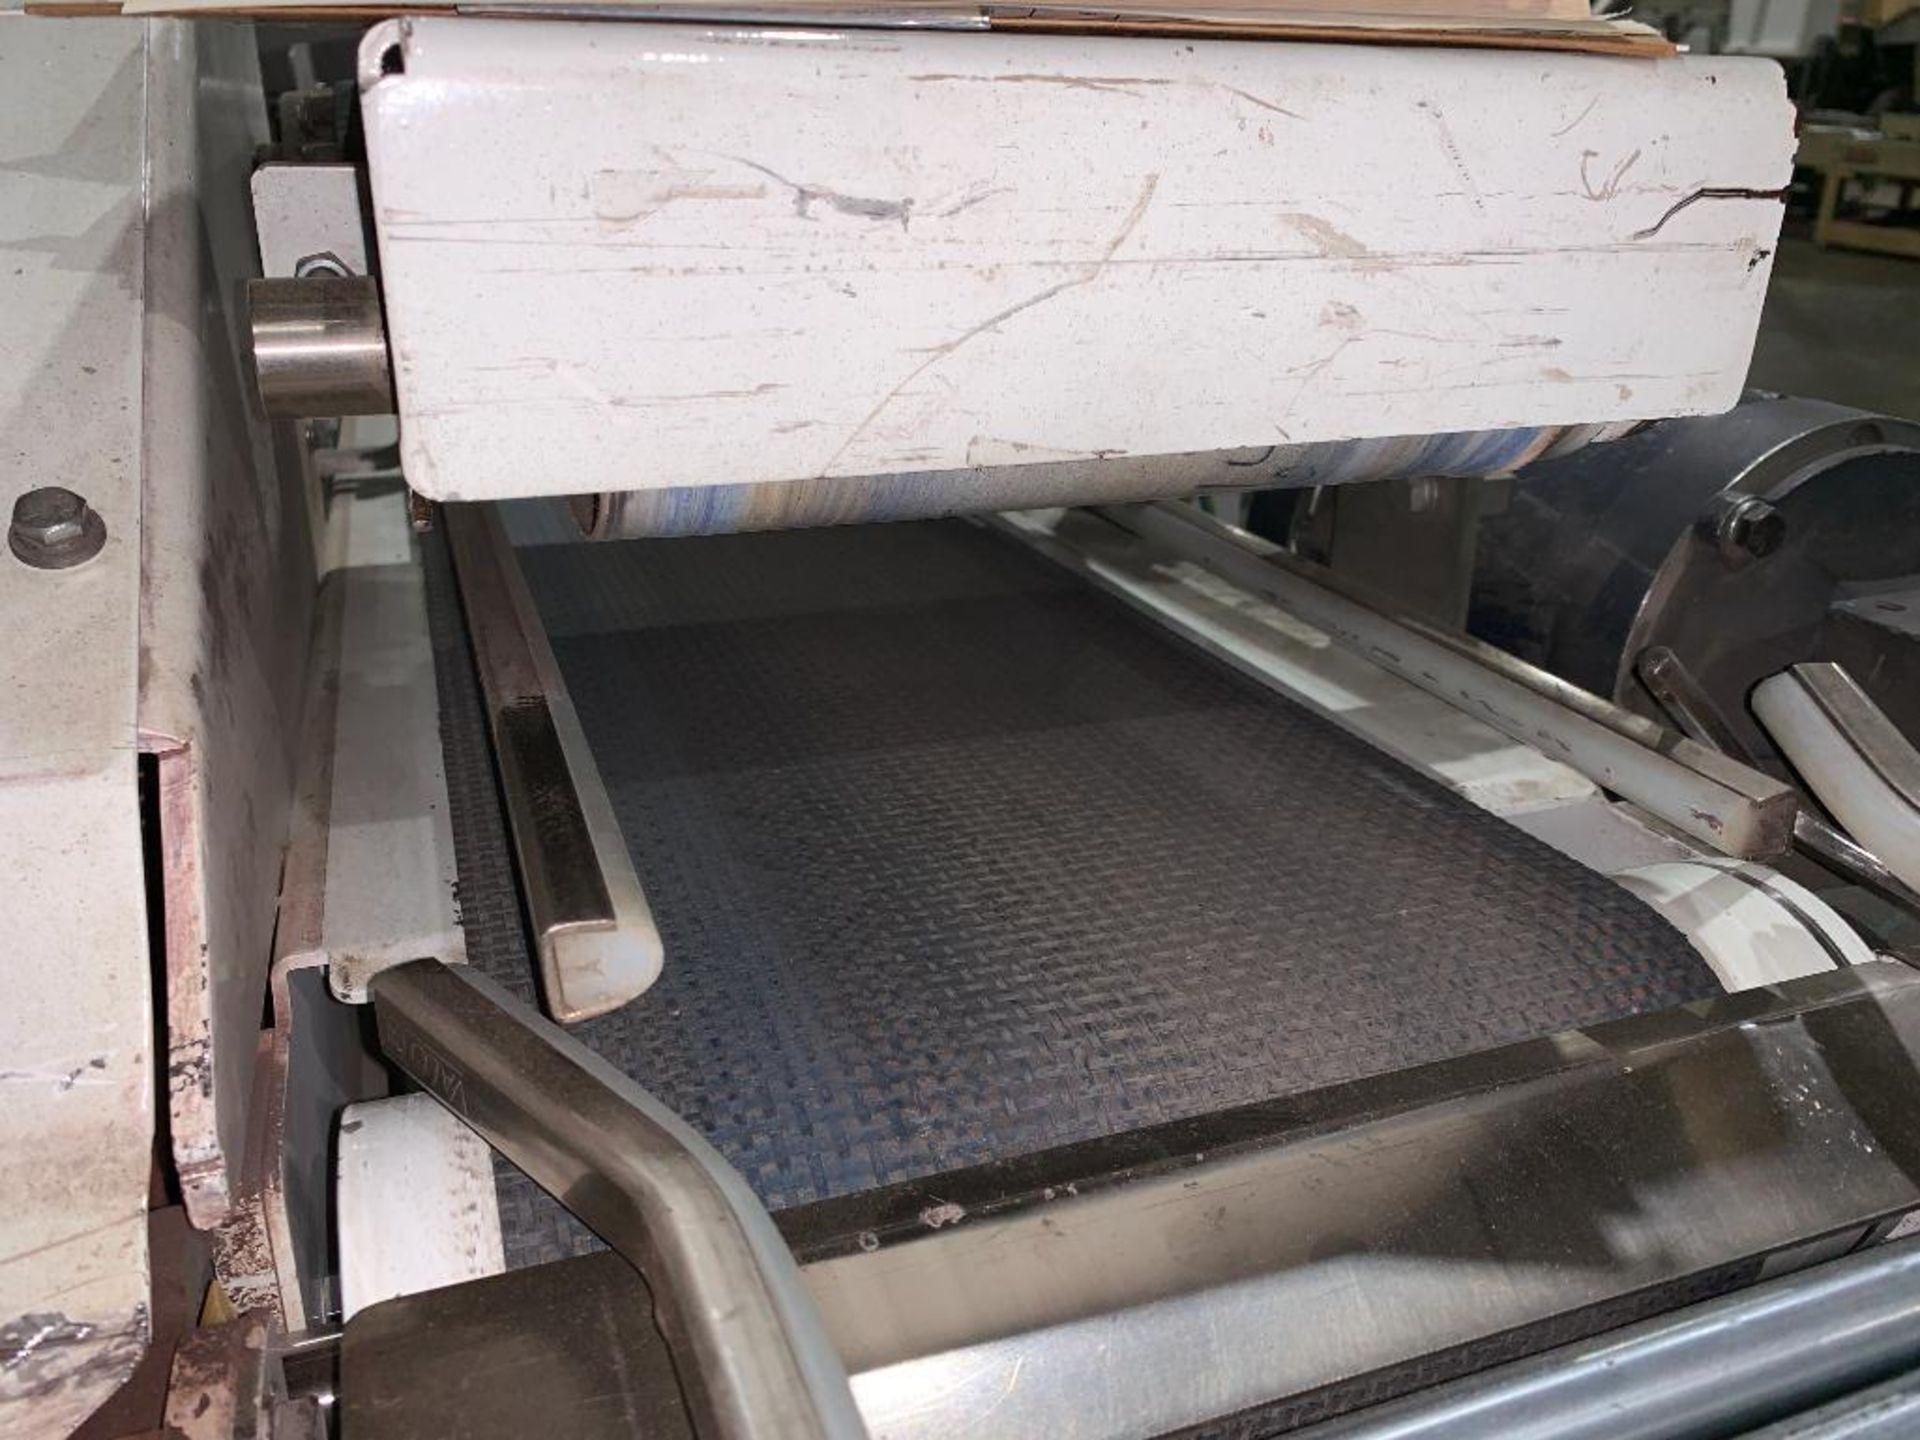 mild steel belt conveyor, 68 in. x 10 in., with box conditioner - Image 8 of 13